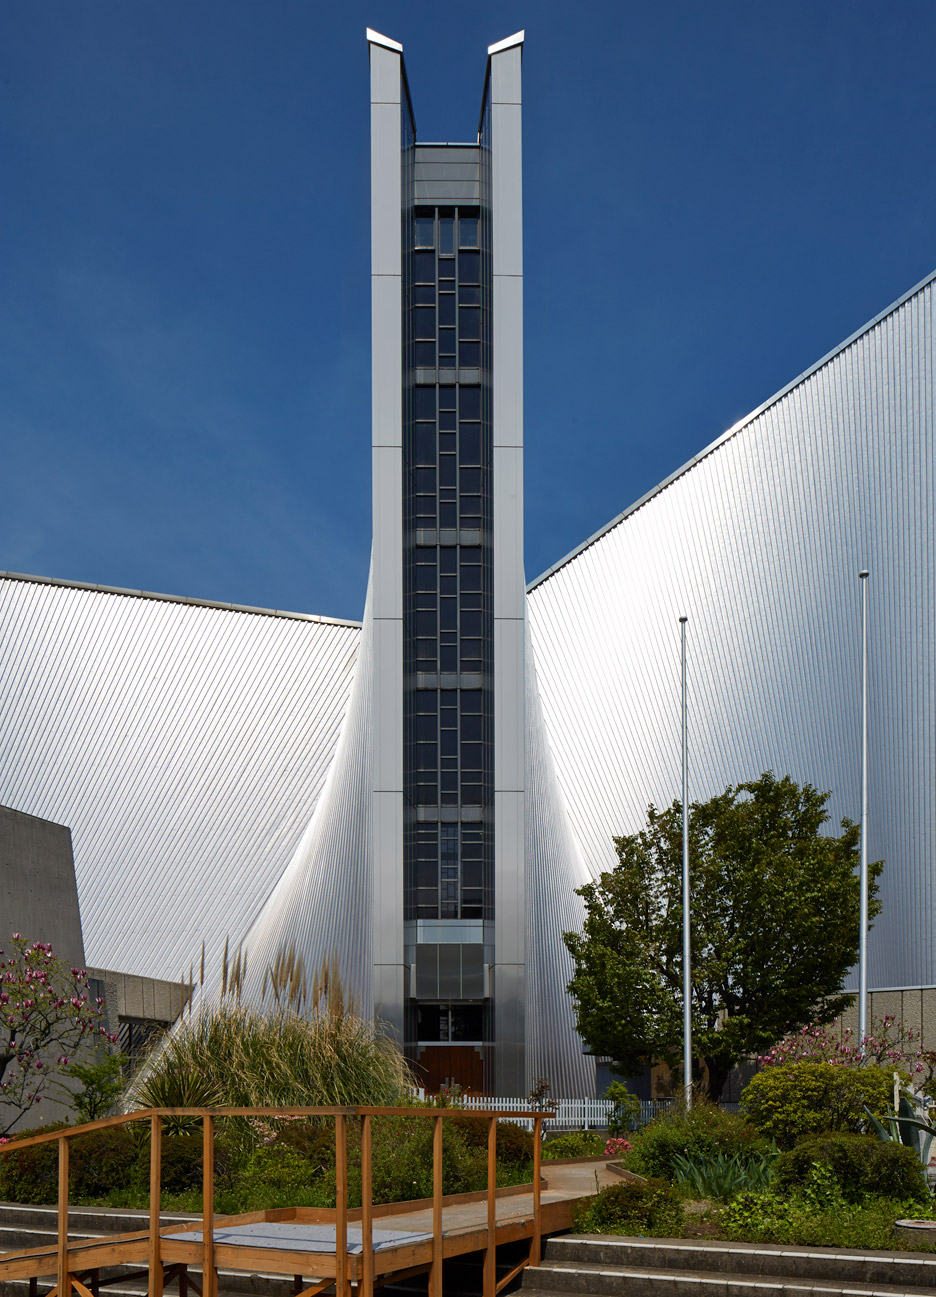 st-marys-cathedral-kenzo-tange-edmund-sumner-photography-tokyo-japan_dezeen_936_2